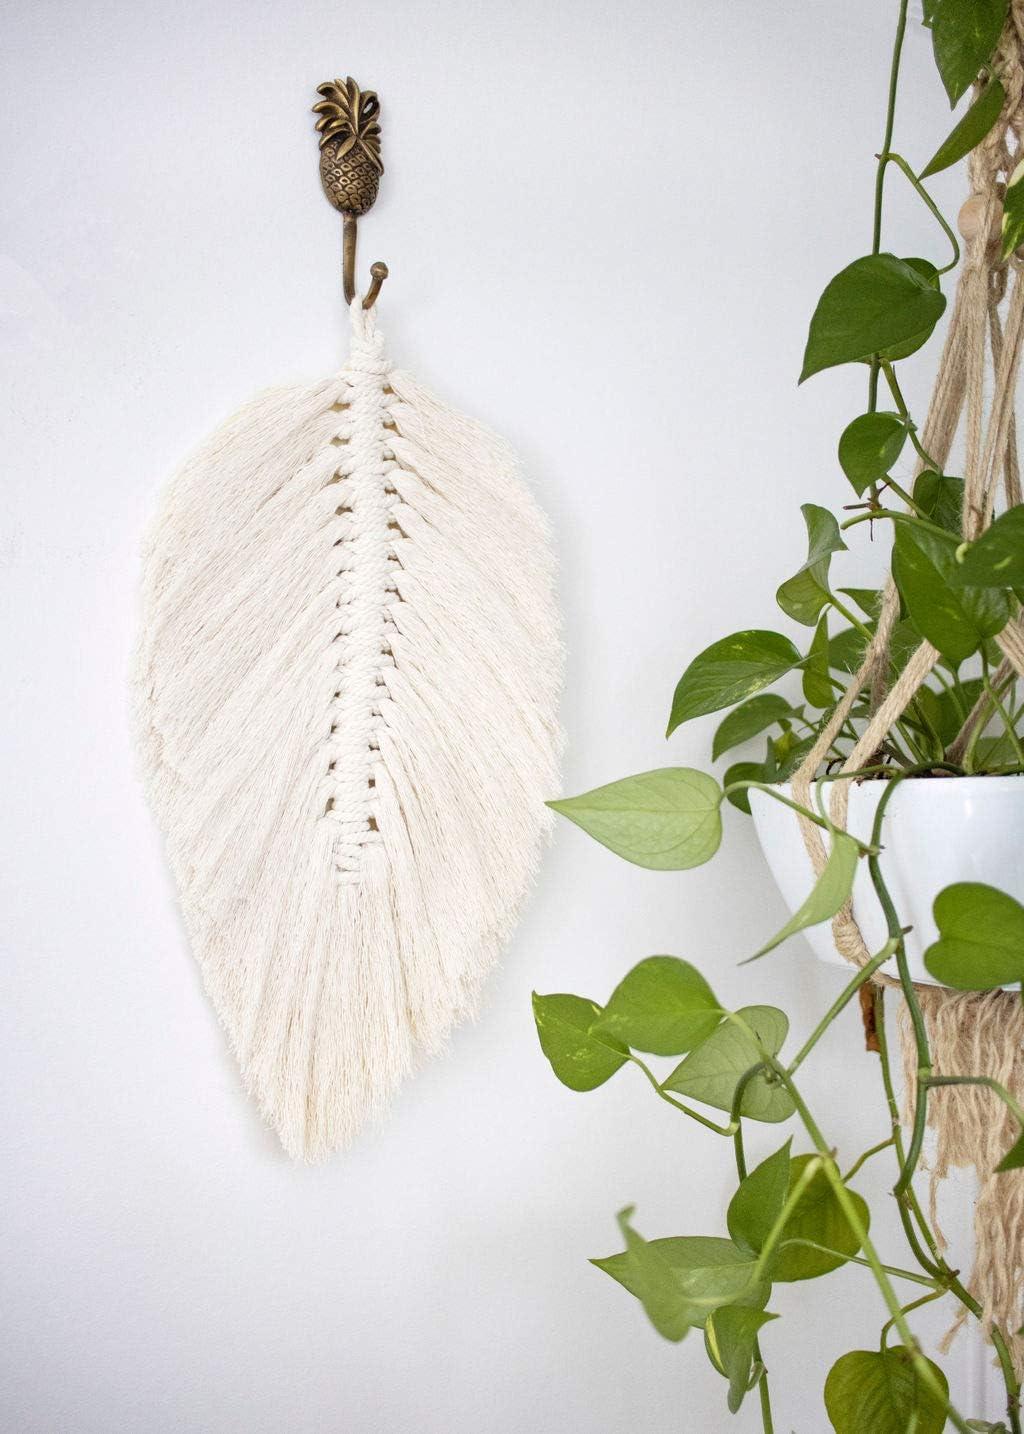 "Macrame Feather Wall Hanging - Boho Wall Decor Modern Macrame Décor | Large Macrame Feather 18"" x 9"" | Nursery Décor Dorm Room Bedroom Bohemian Décor"